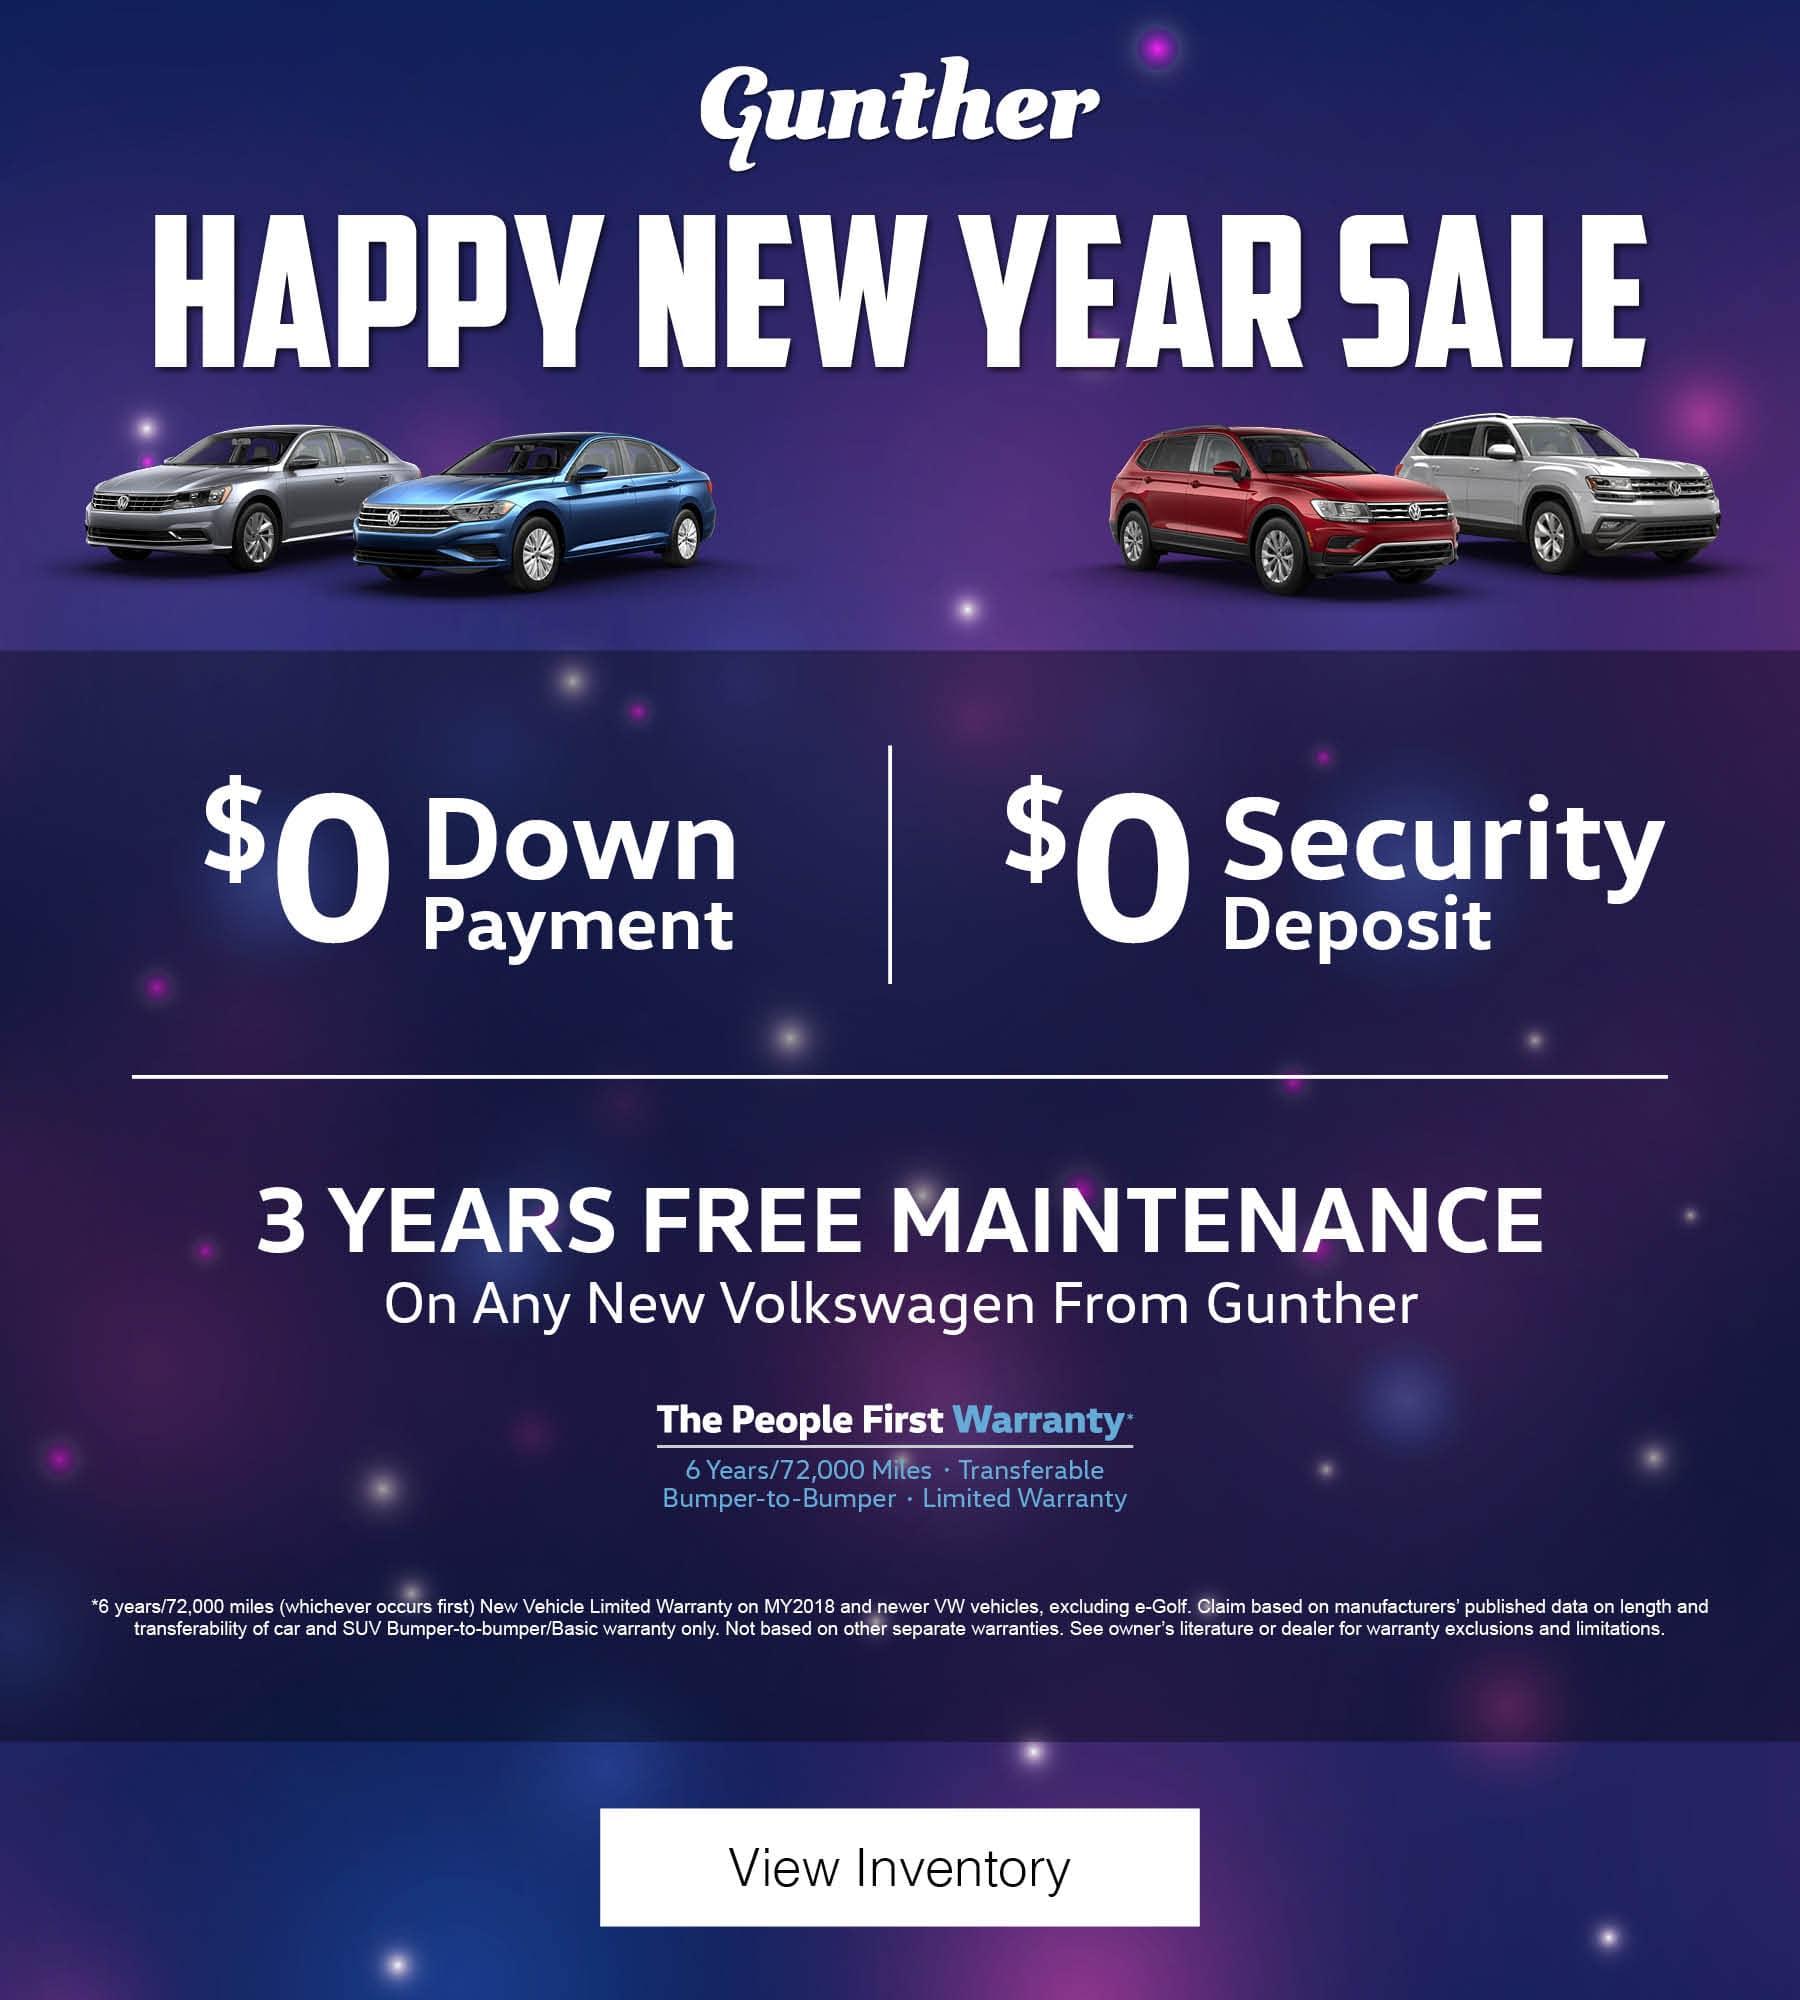 Gunther Happy New Year Sale